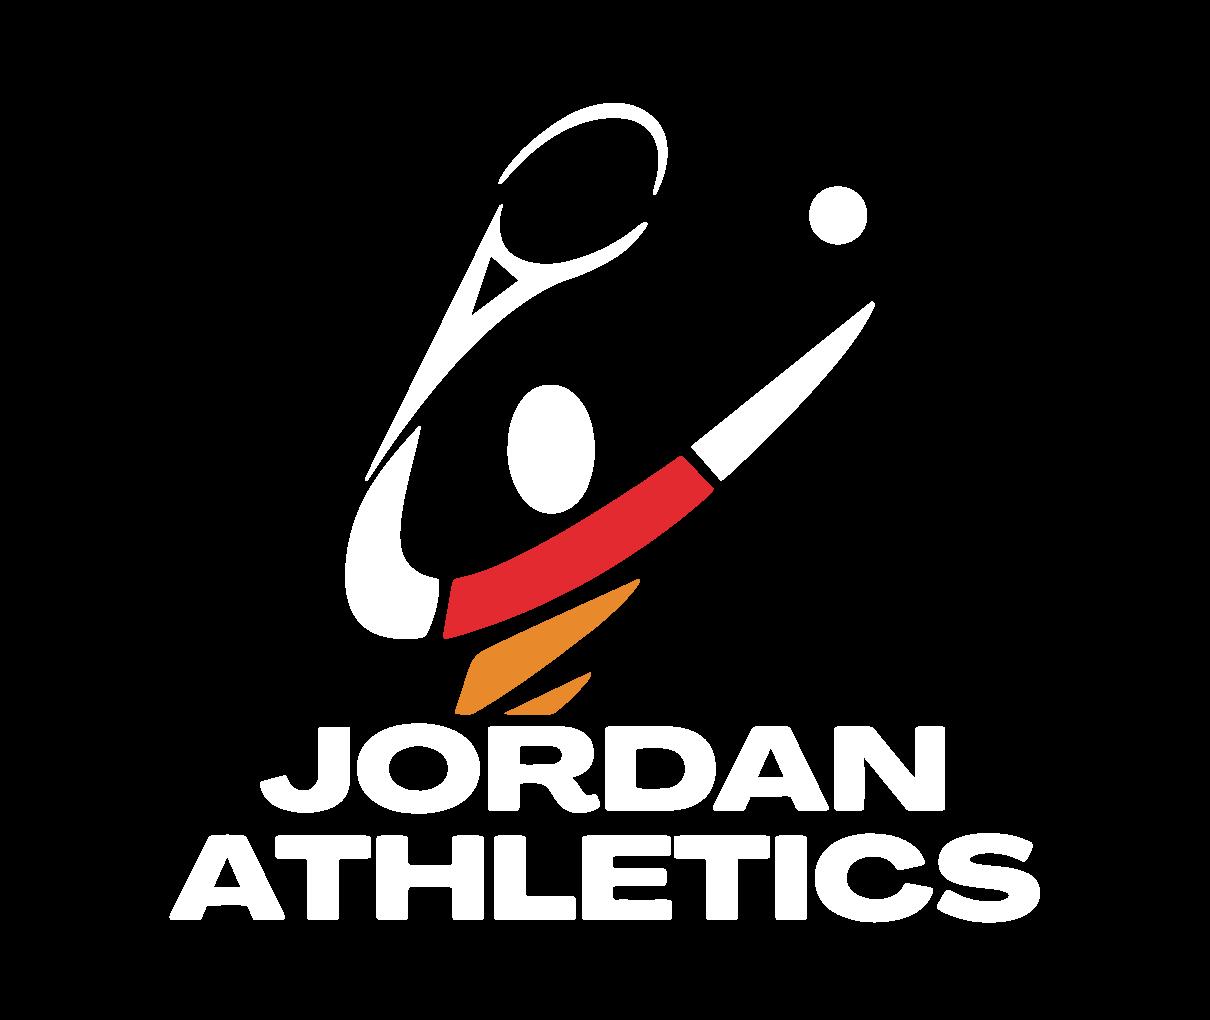 Jordan-Athletics_white